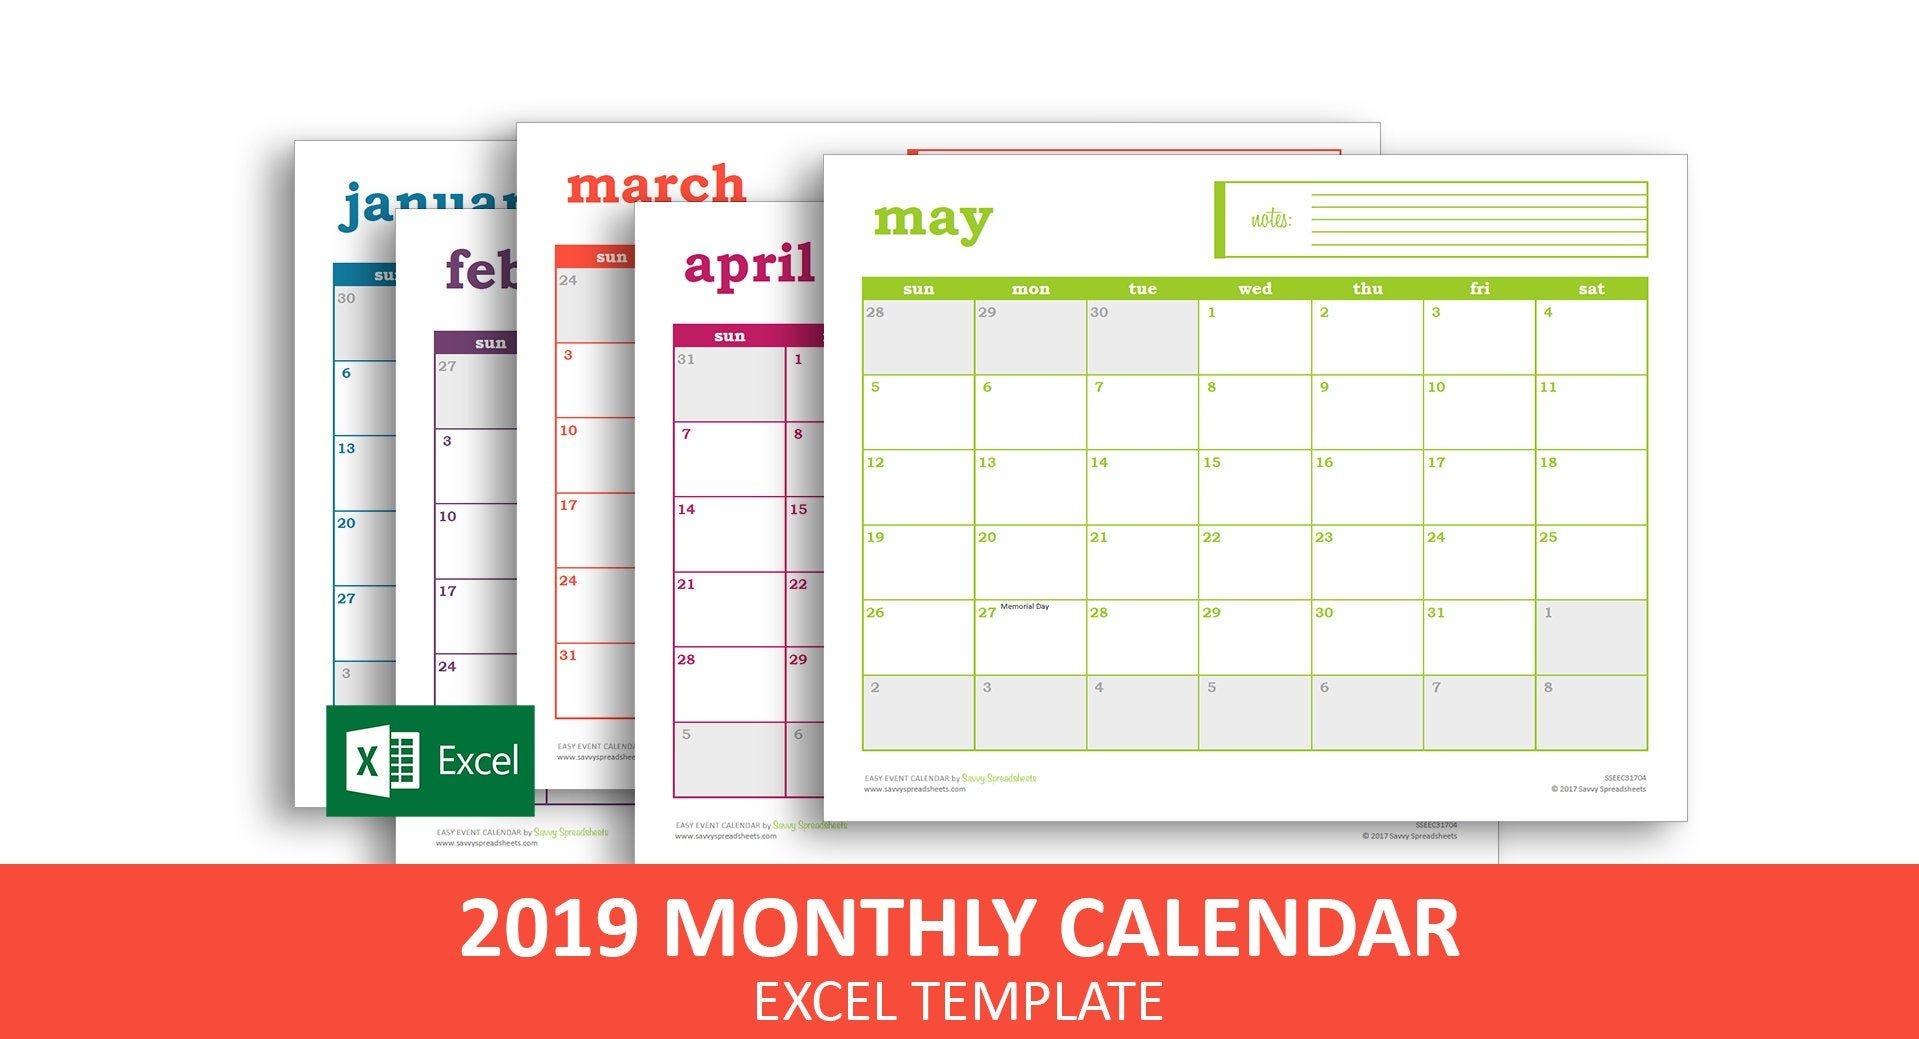 Easy Event Calendar 2019 Excel Template Printable Monthly | Etsy Calendar 2019 Excel Romania